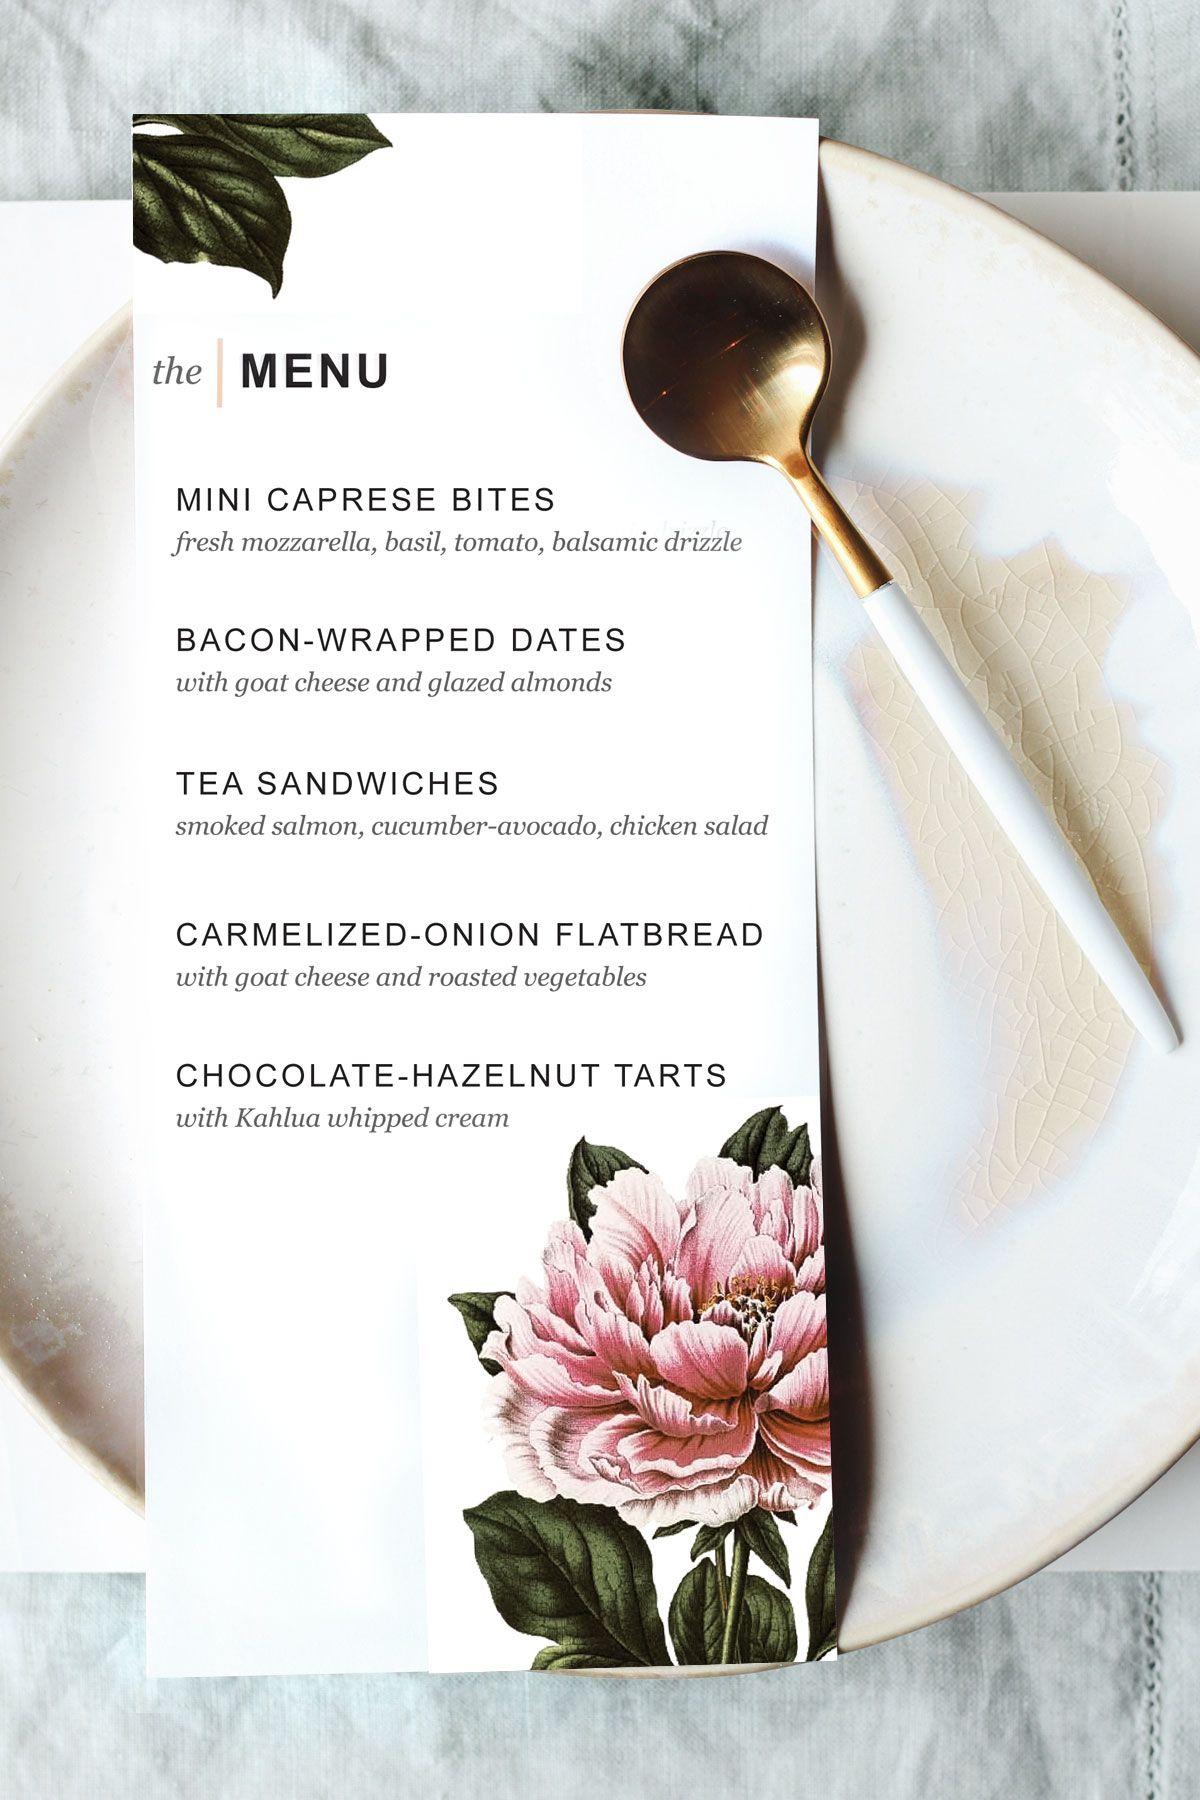 Printable Dinner Party Menu Template | Party Planning | Pinterest - Free Printable Wedding Menu Card Templates